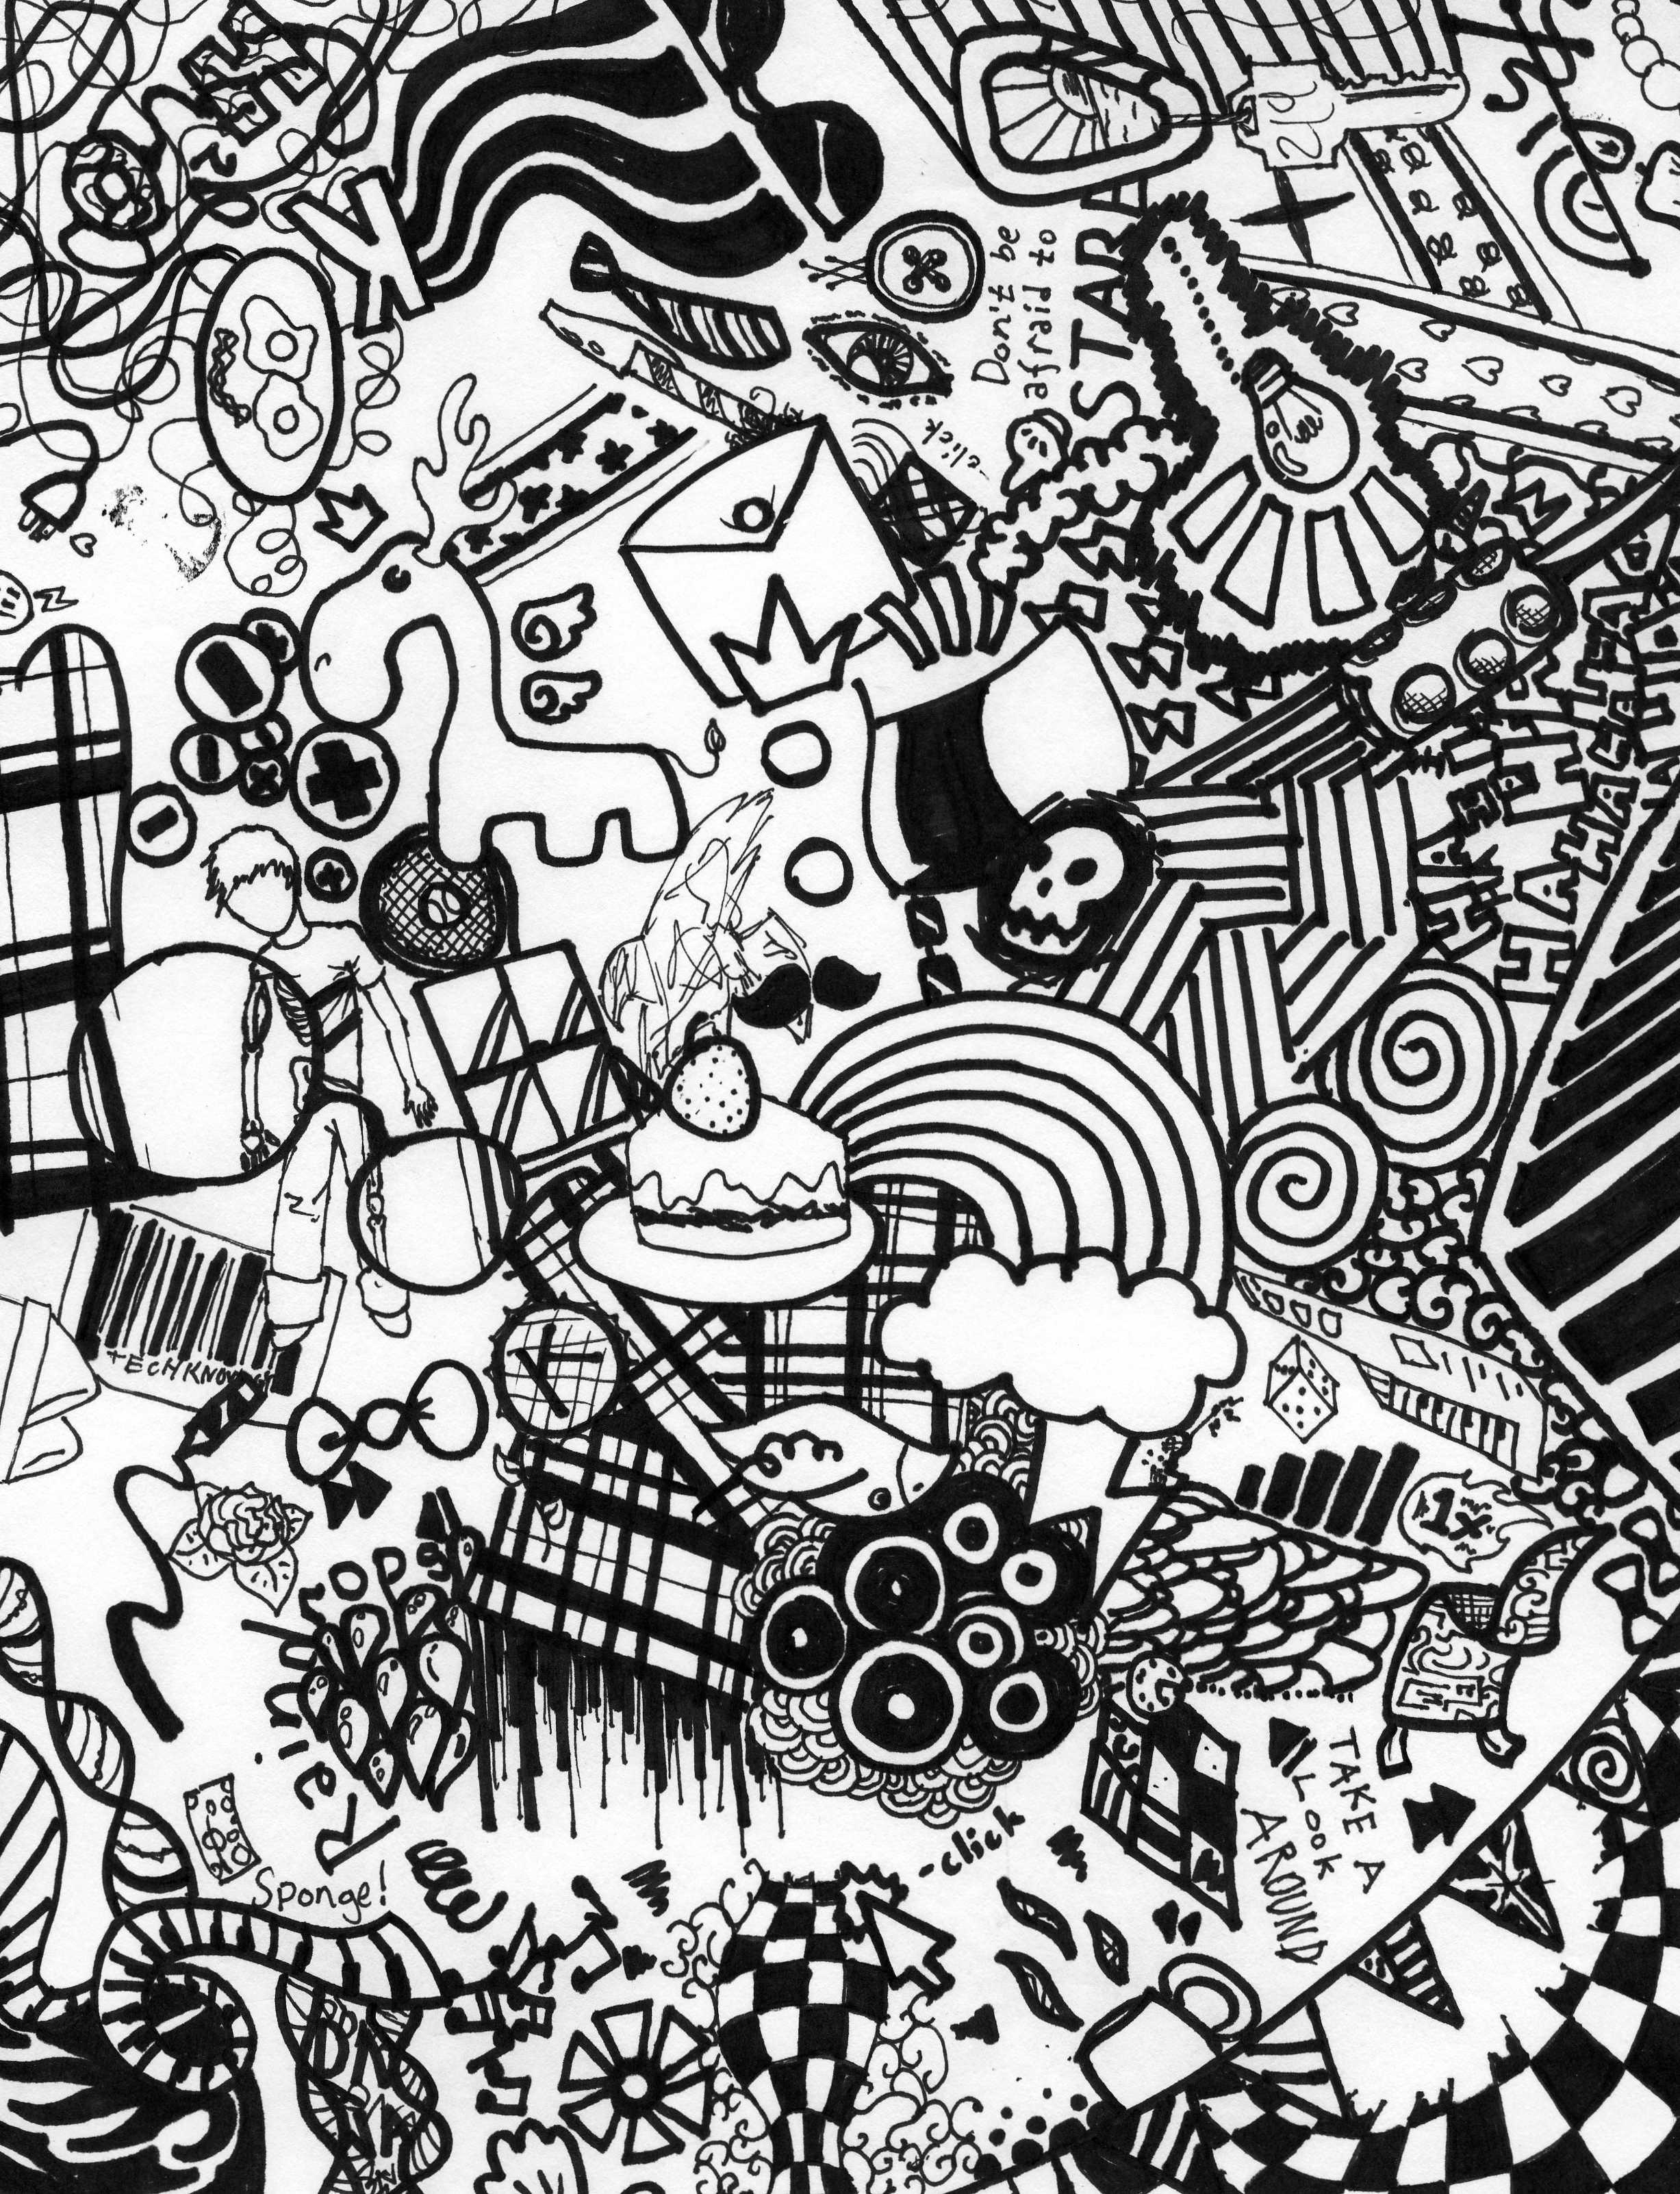 2454x3204 Images About Sharpie Art On Sensational Cool Designs